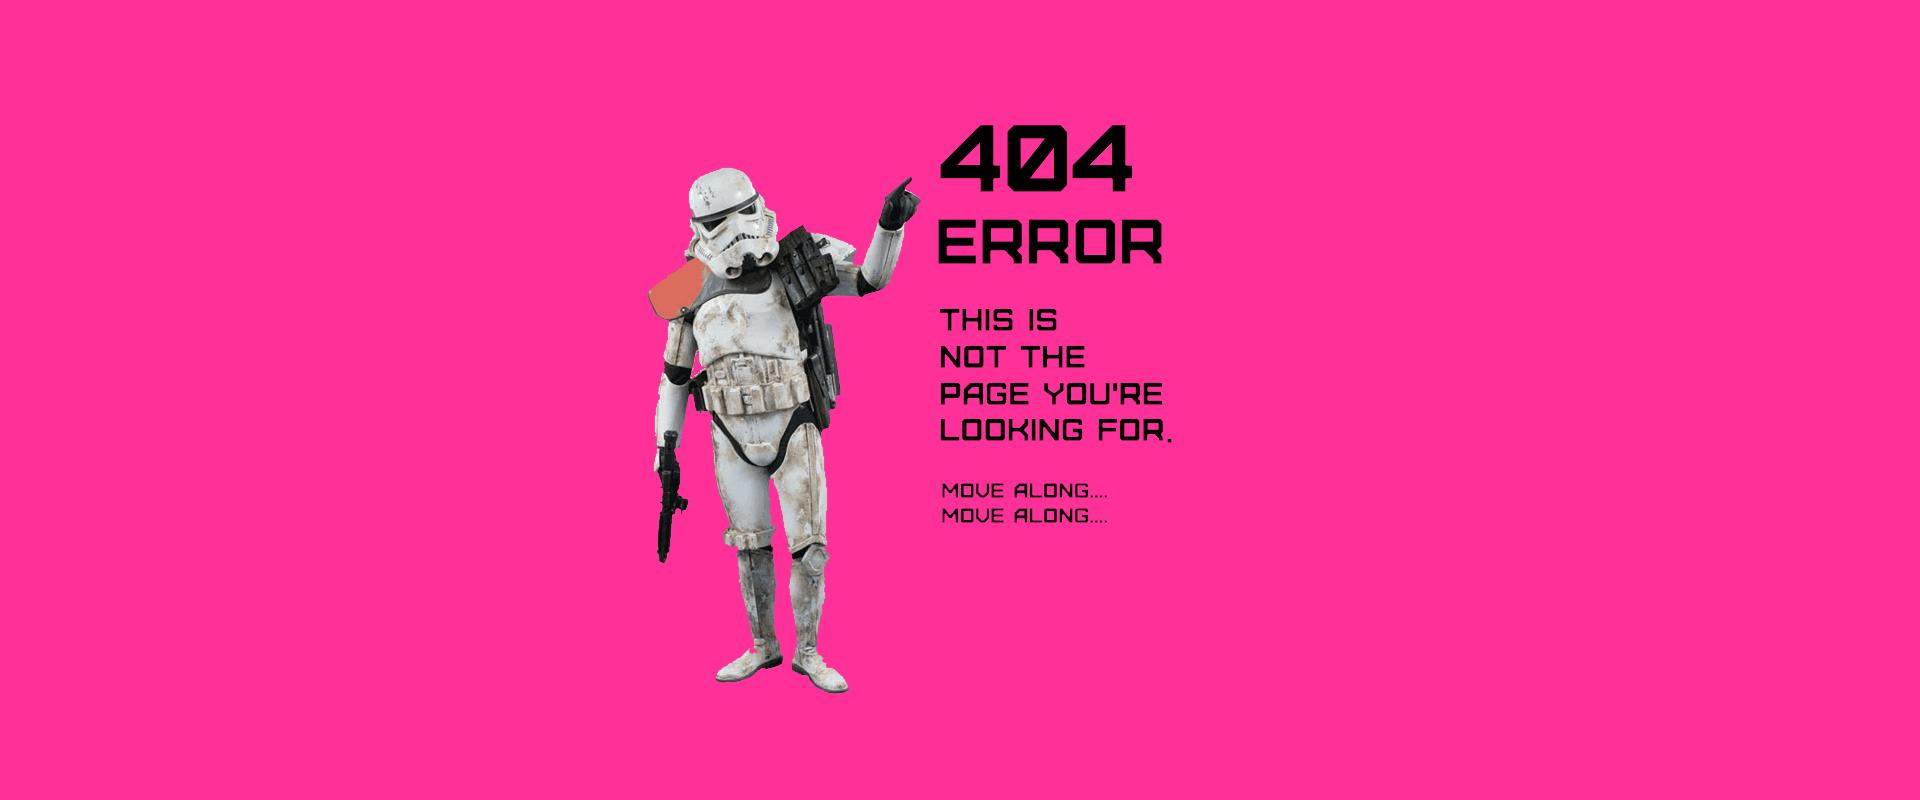 404 Link Checker